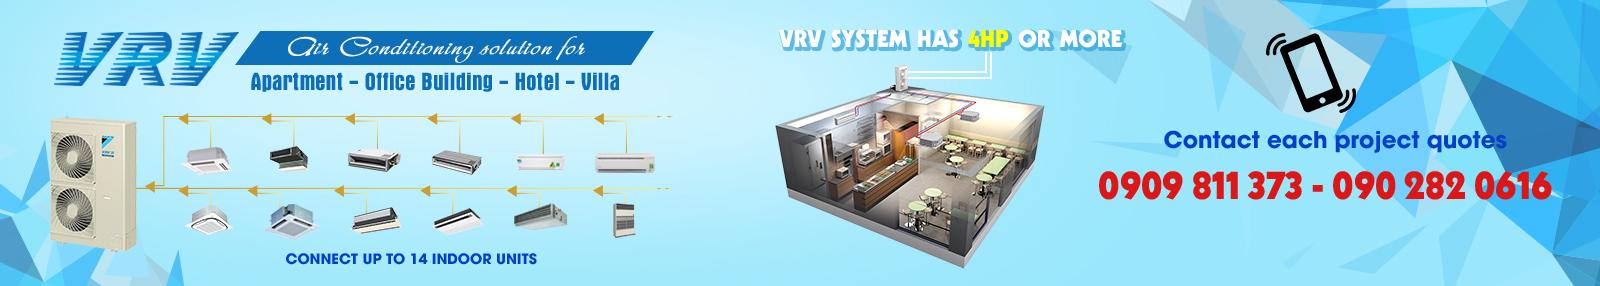 Hệ thống VRV